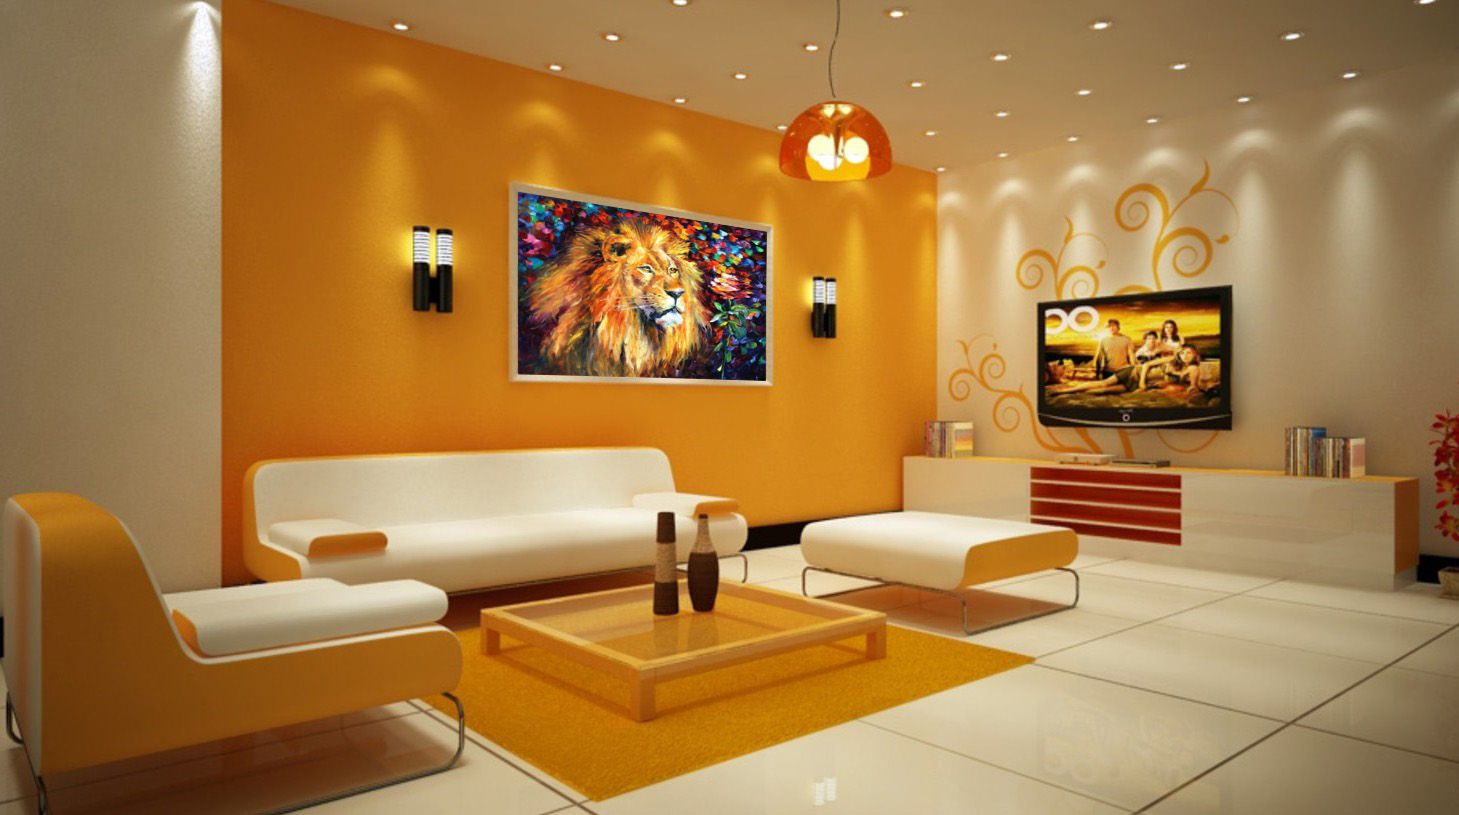 Lion Palette Knife Oil Painting On Canvas Living Room Orange